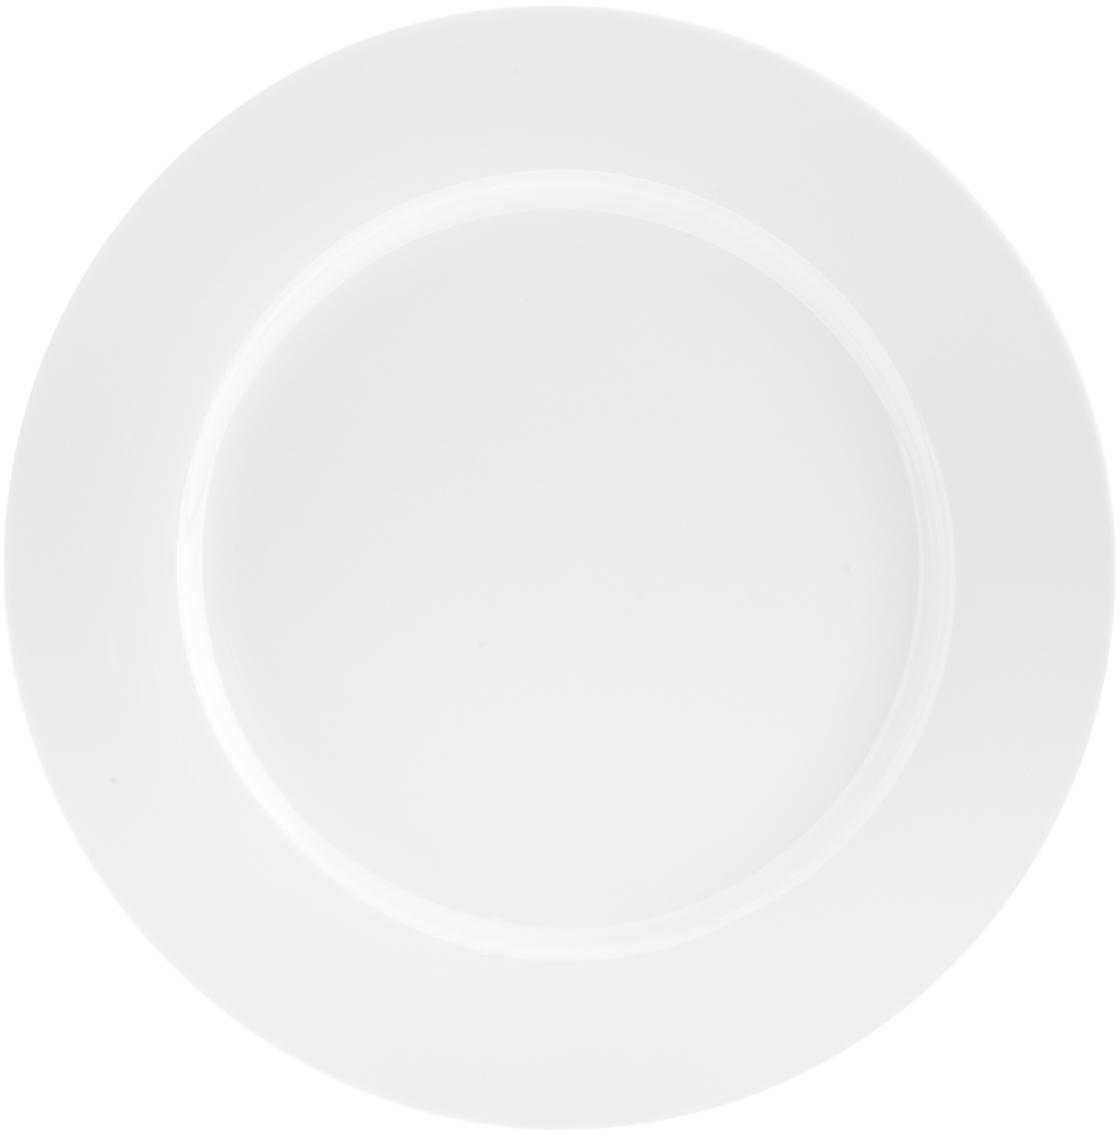 Talerz duży Delight Classic, 2 szt., Porcelana, Biały, Ø 27 cm